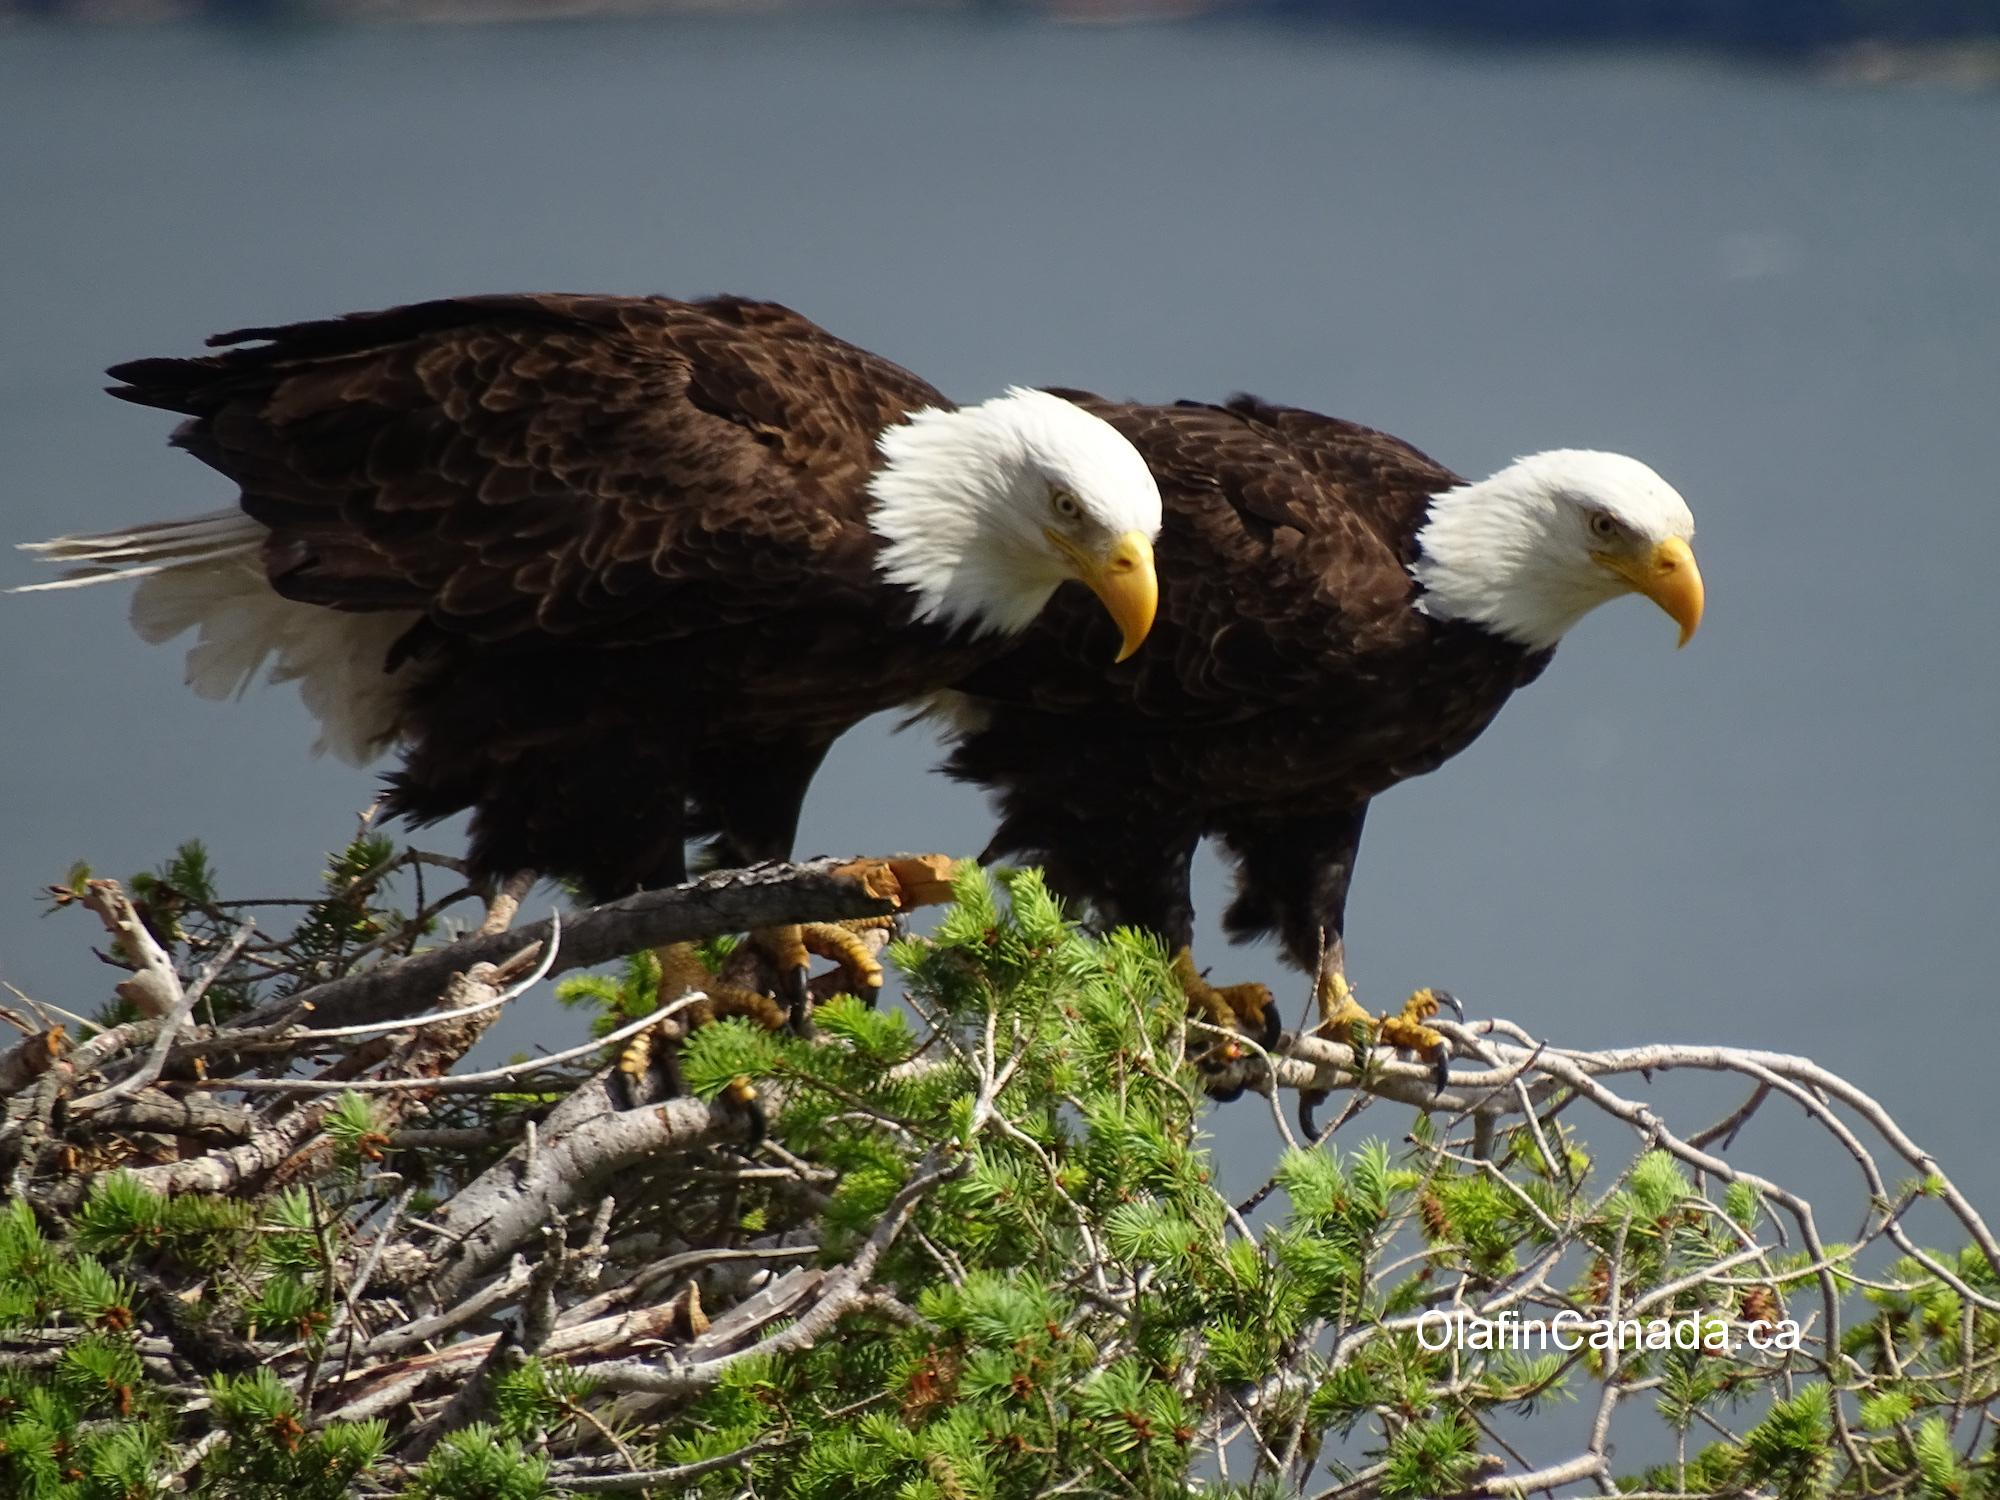 A pair of bald eagles on their nest above the Okanagan Lake #olafincanada #britishcolumbia #discoverbc #wildlife #baldeagle #okanagan